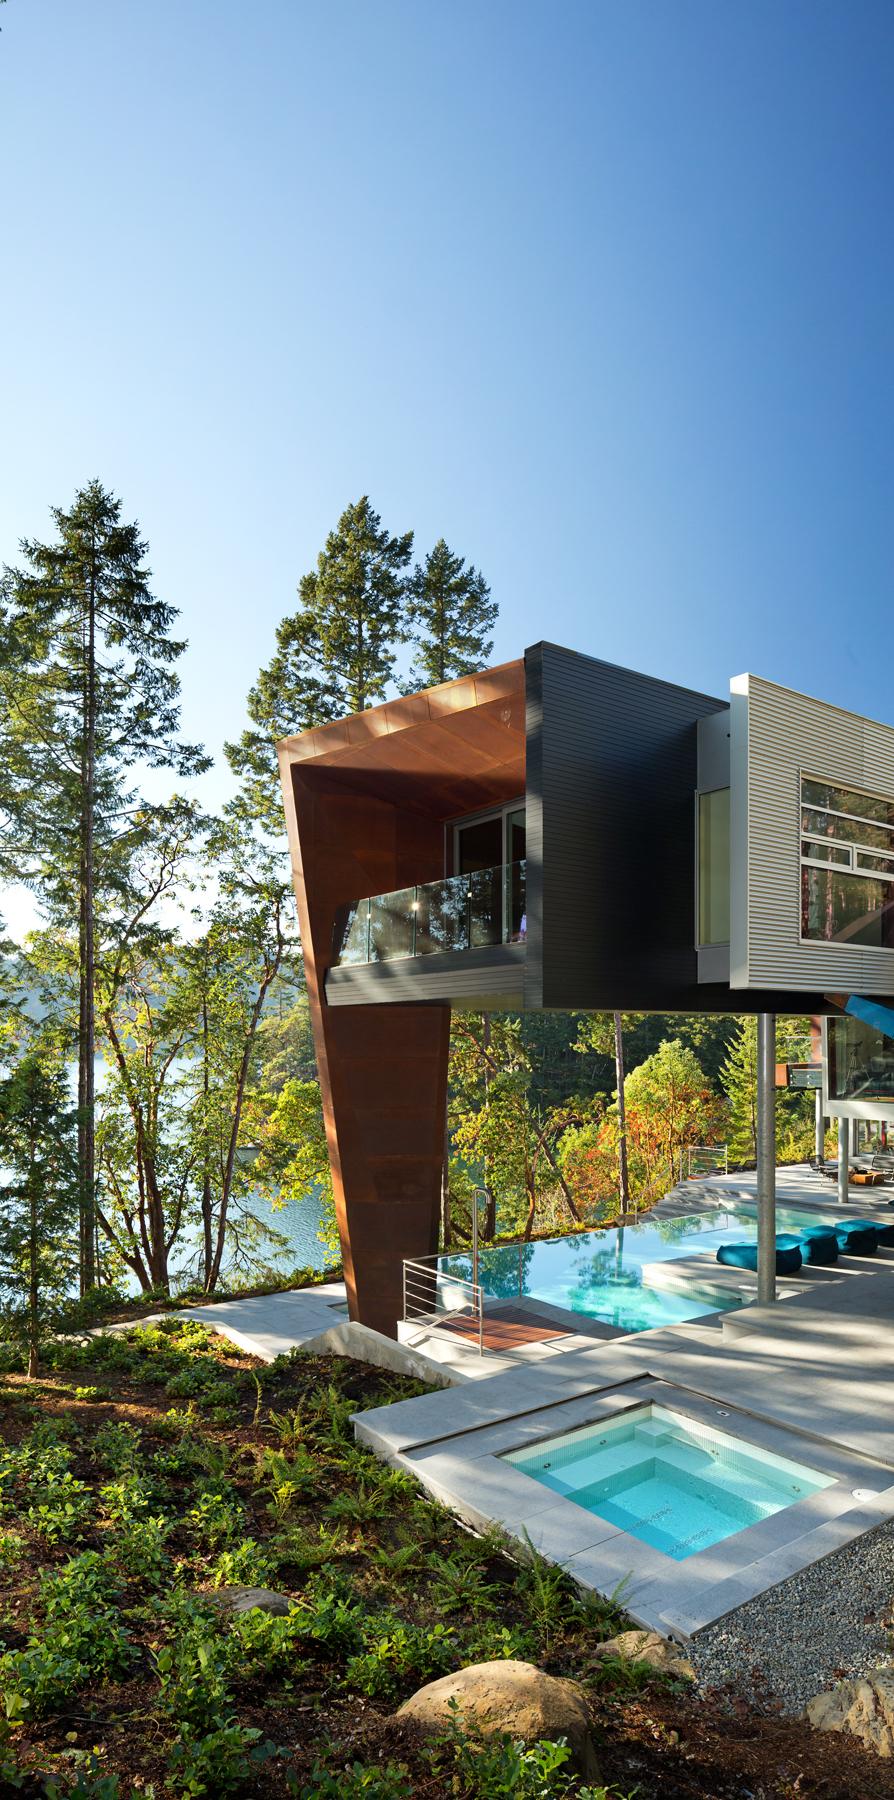 Gulf+Islands+Vancouver+lake+house